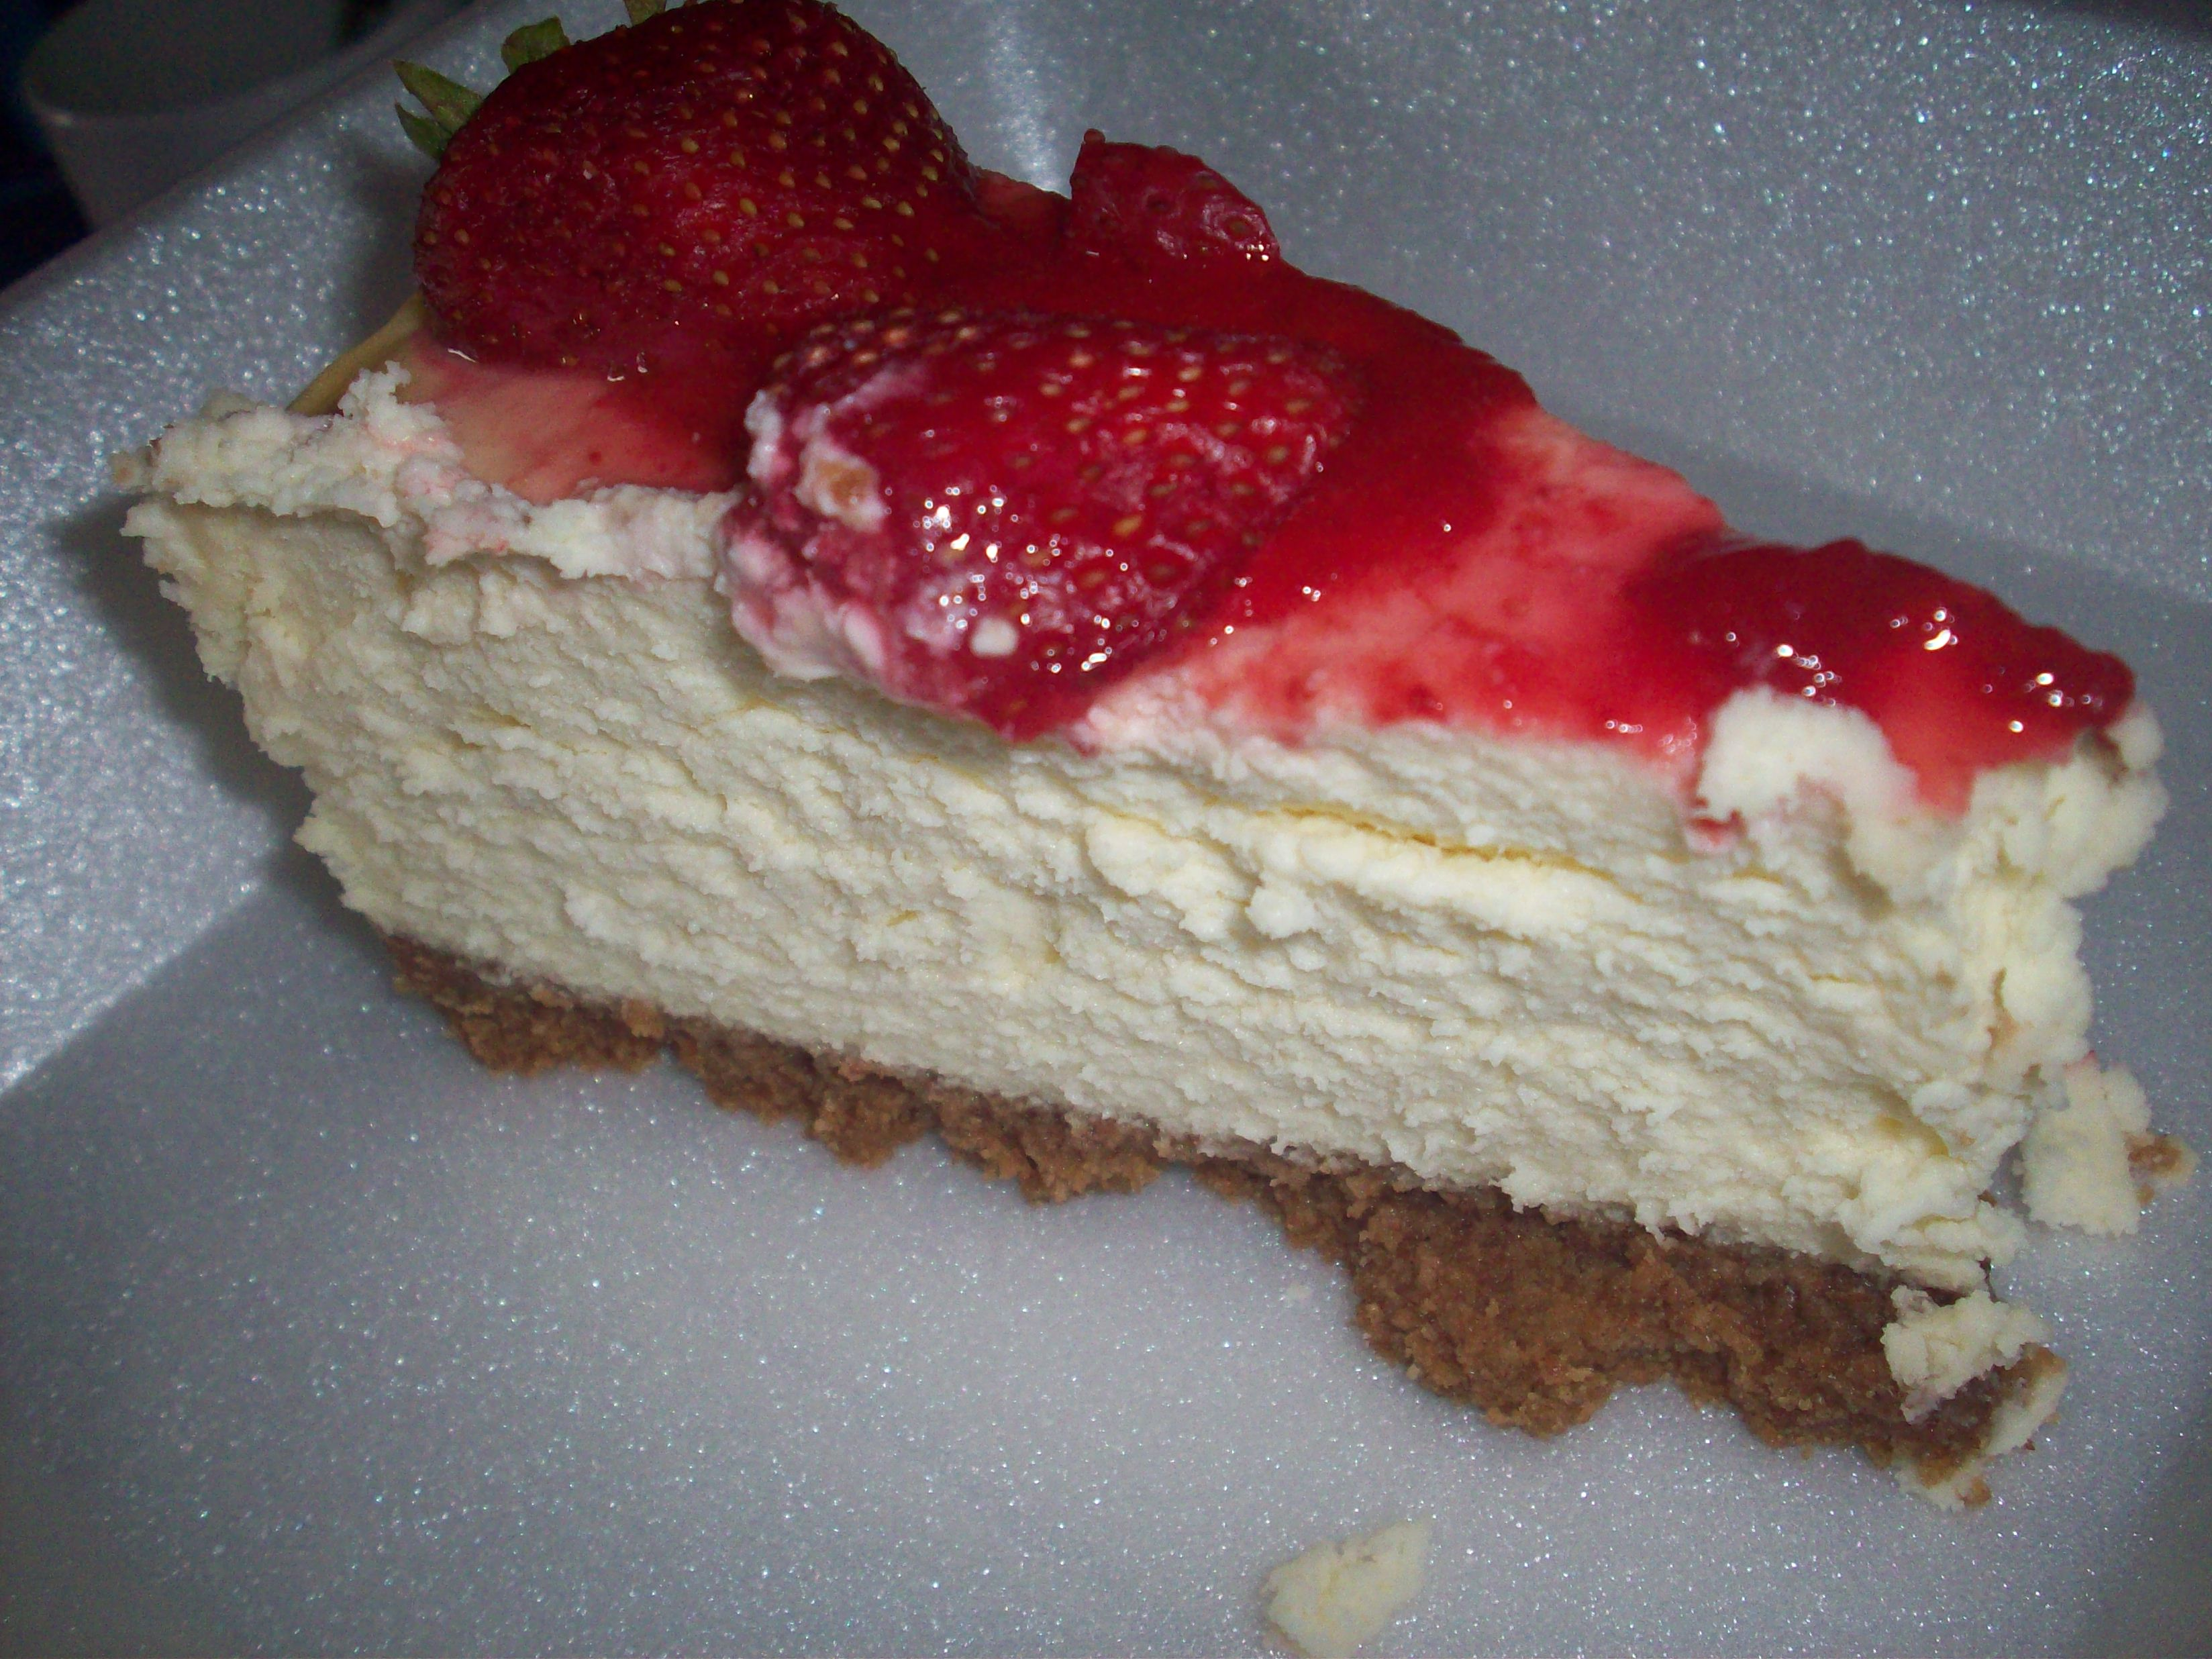 http://foodloader.net/cutie_2010-09-26_Cheesecake.jpg